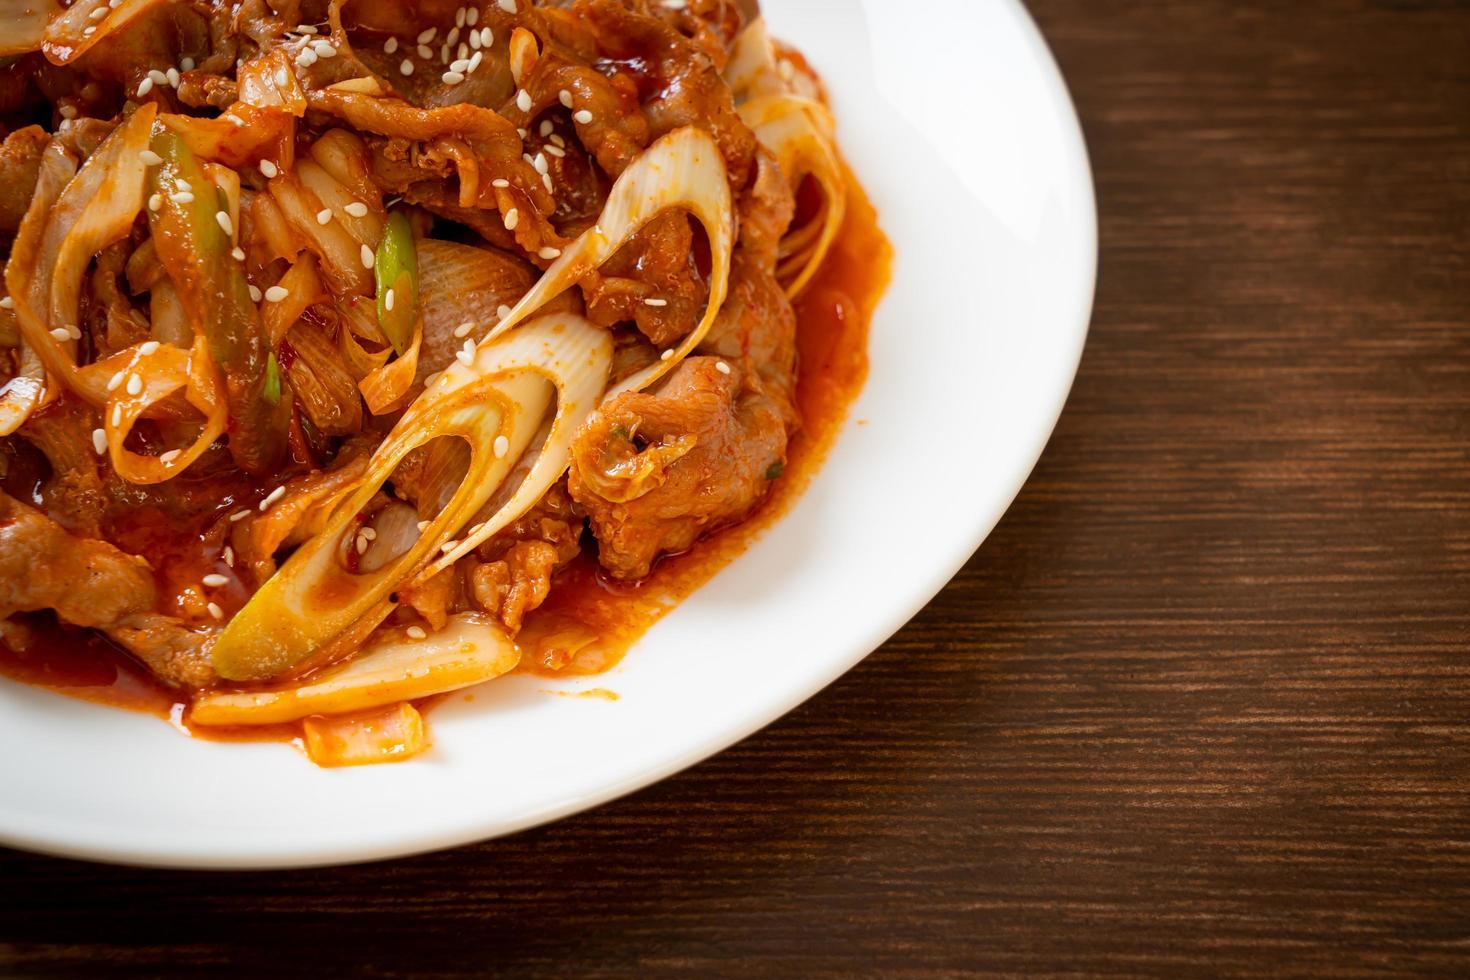 cerdo salteado con pasta picante coreana y kimchi foto